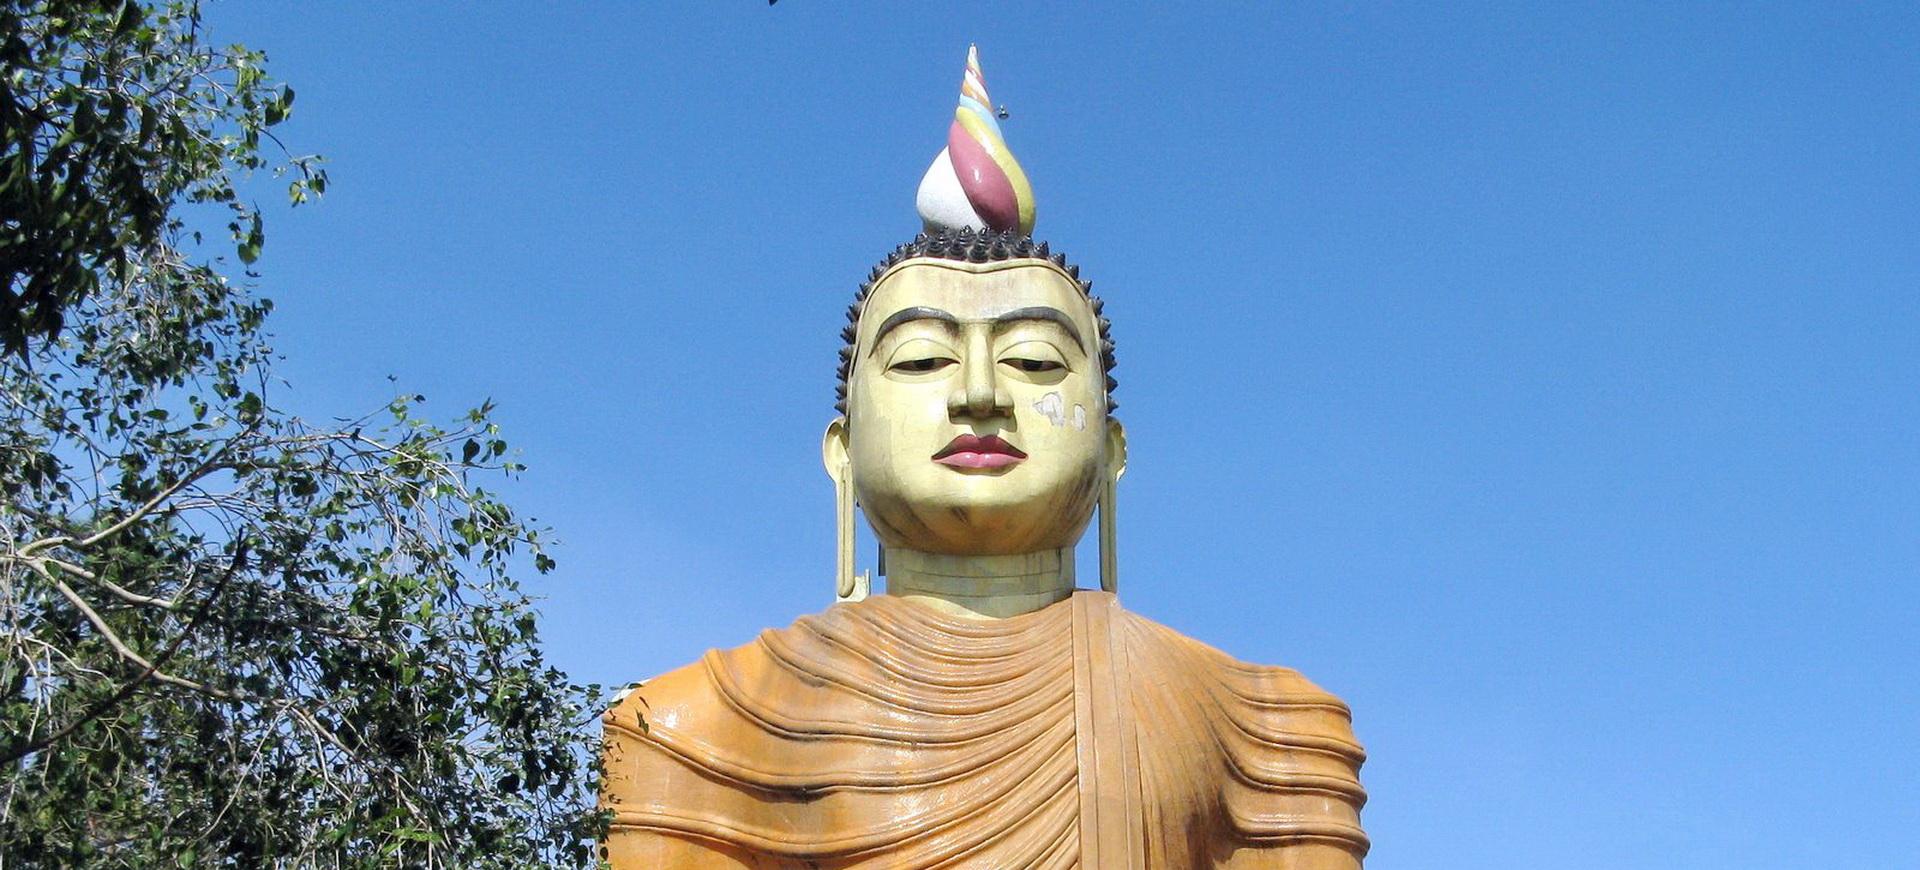 Formalités visa de tourisme pour Sri Lanka